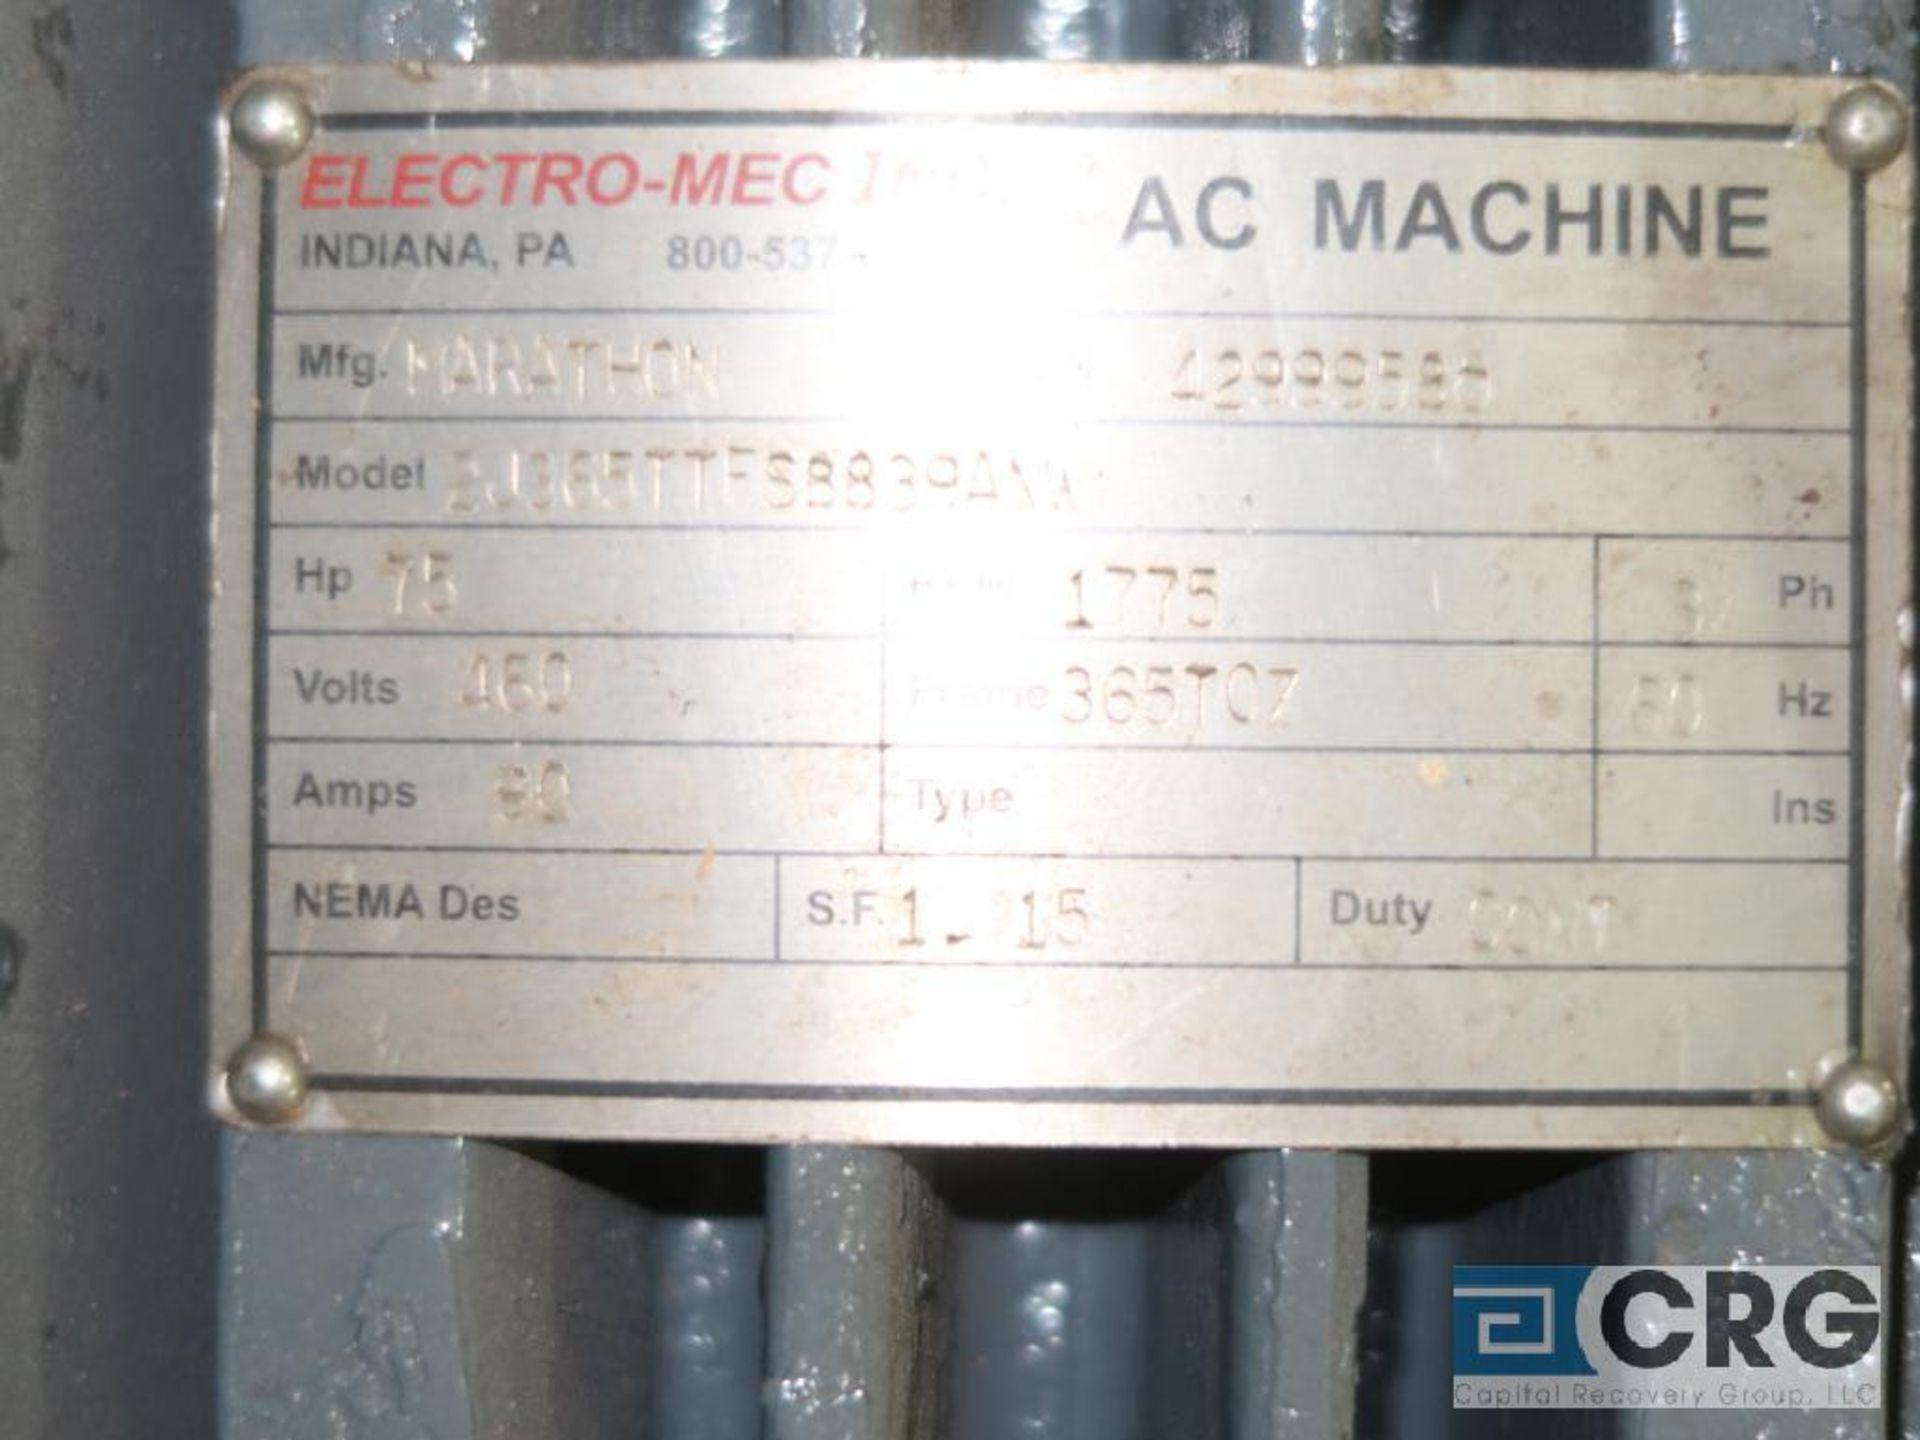 Marathon AC machine motor, 75 HP, 1,775 RPMs, 460 volt, 3 ph., 365TCZ frame (Finish Building) - Image 2 of 2